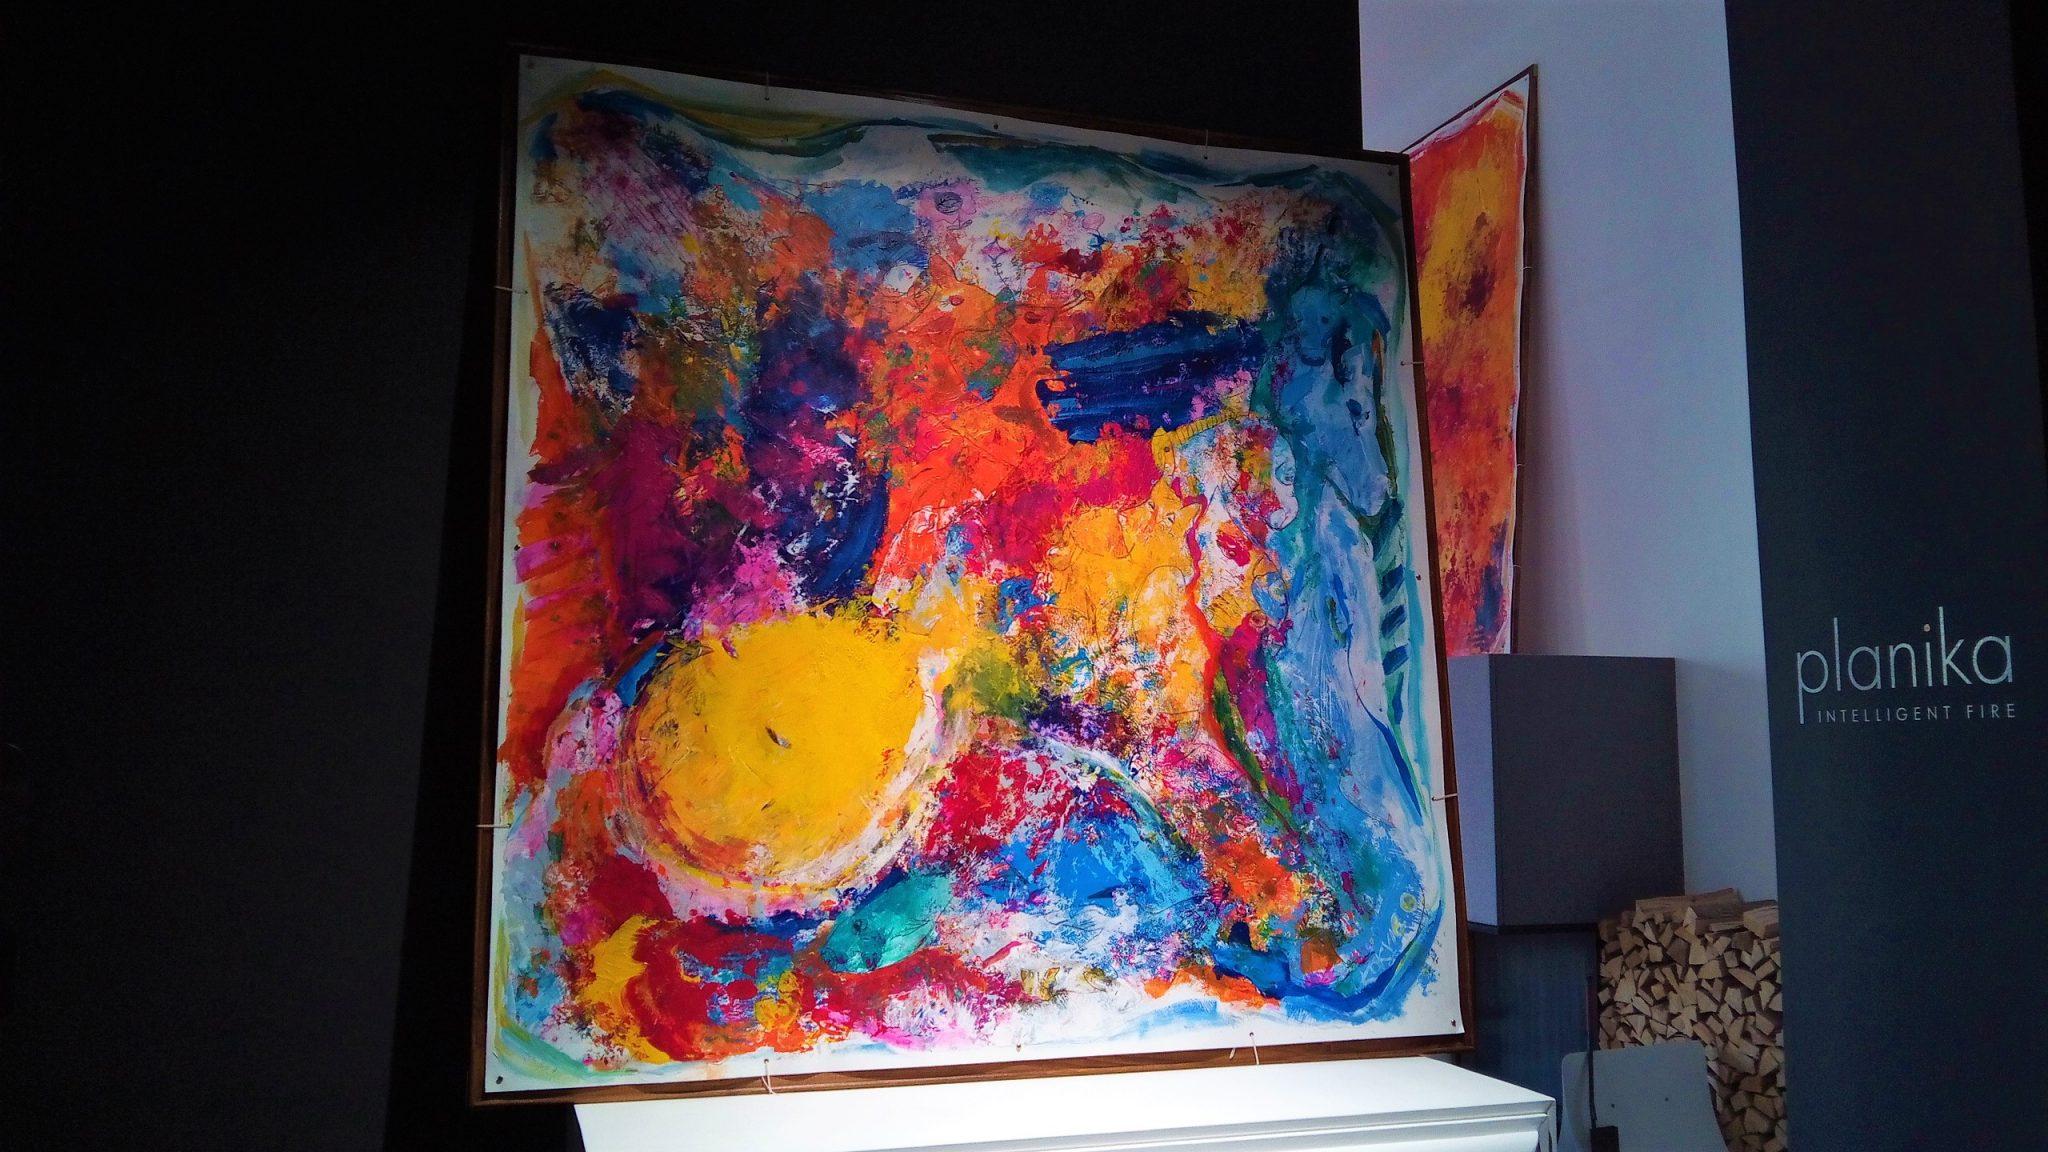 Kim Okura FALLING IN 1.55 x 1.55 meter, object painting, cycle Trophaeen